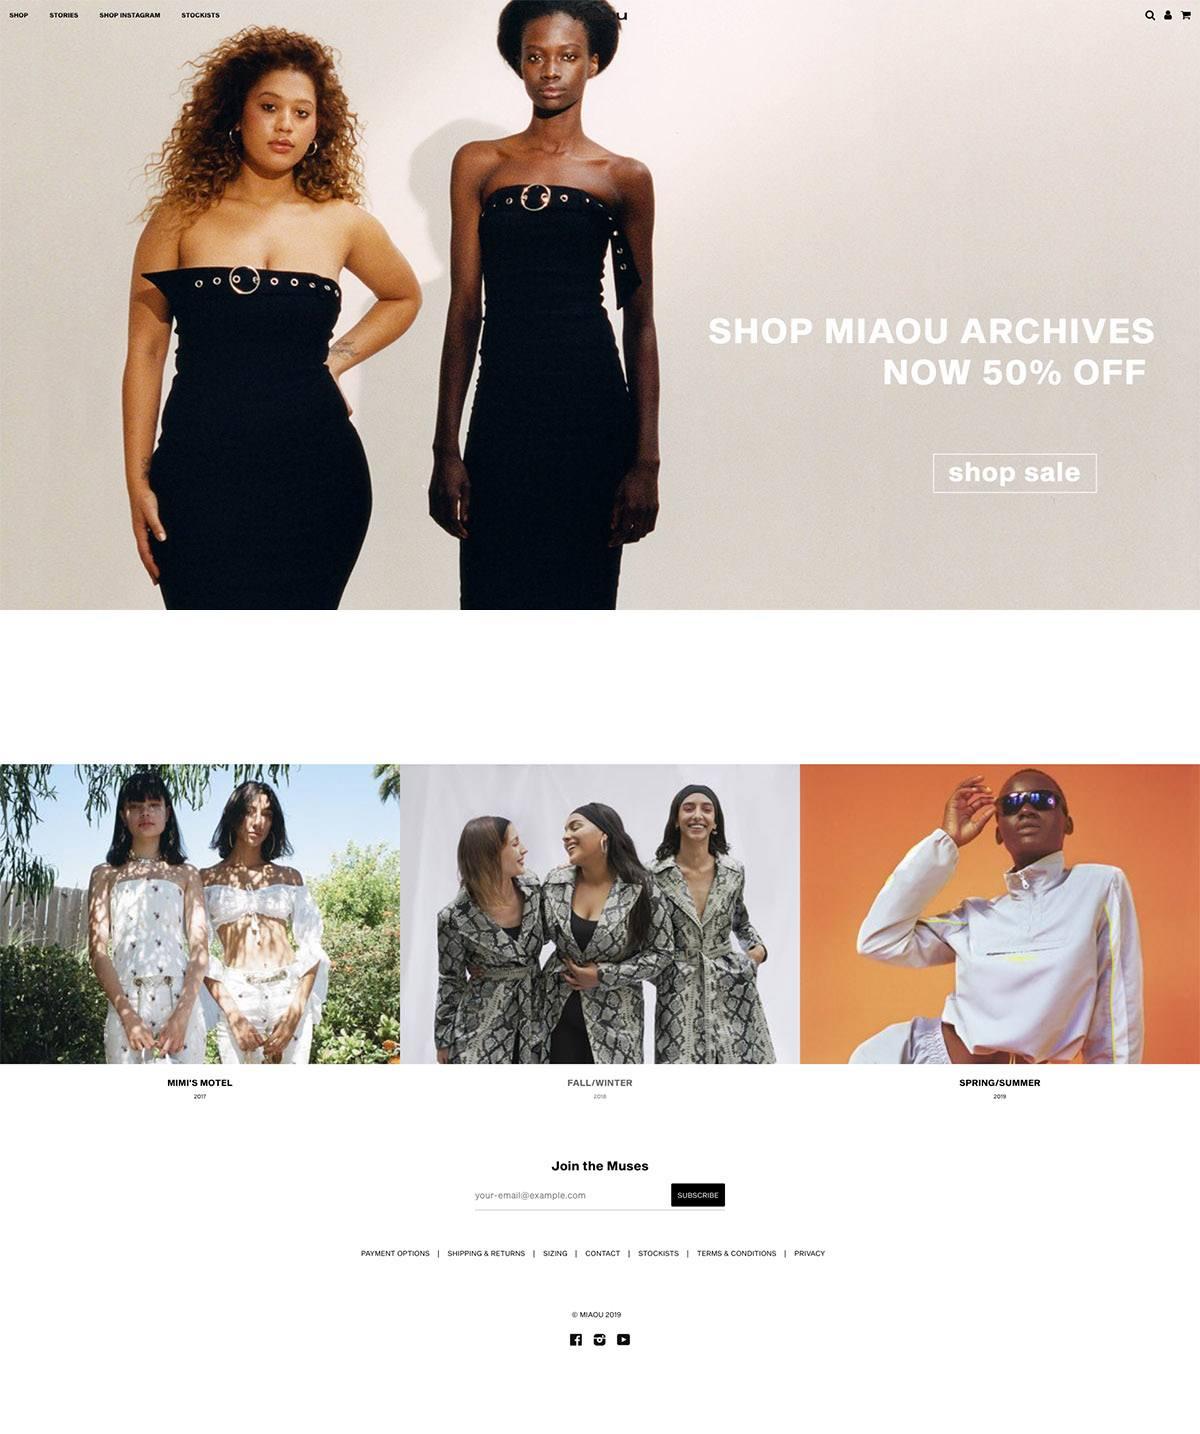 eCommerce website: MIAOU